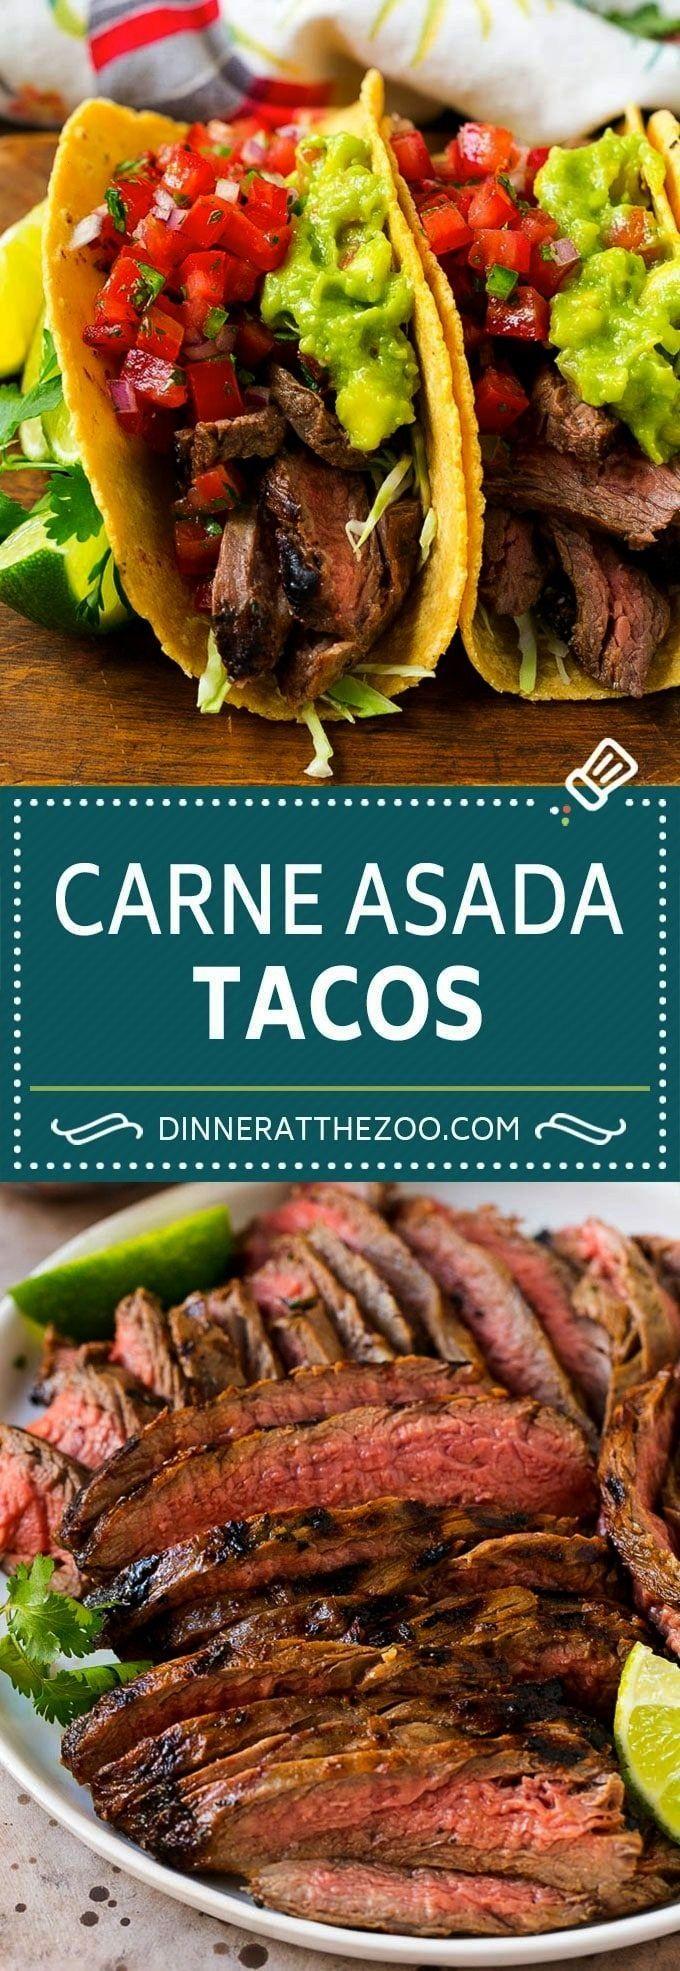 Asada Tacos Recipe | Beef Tacos | Steak Tacos | Carne AsadaCarne Asada Tacos Recipe | Beef Tacos |